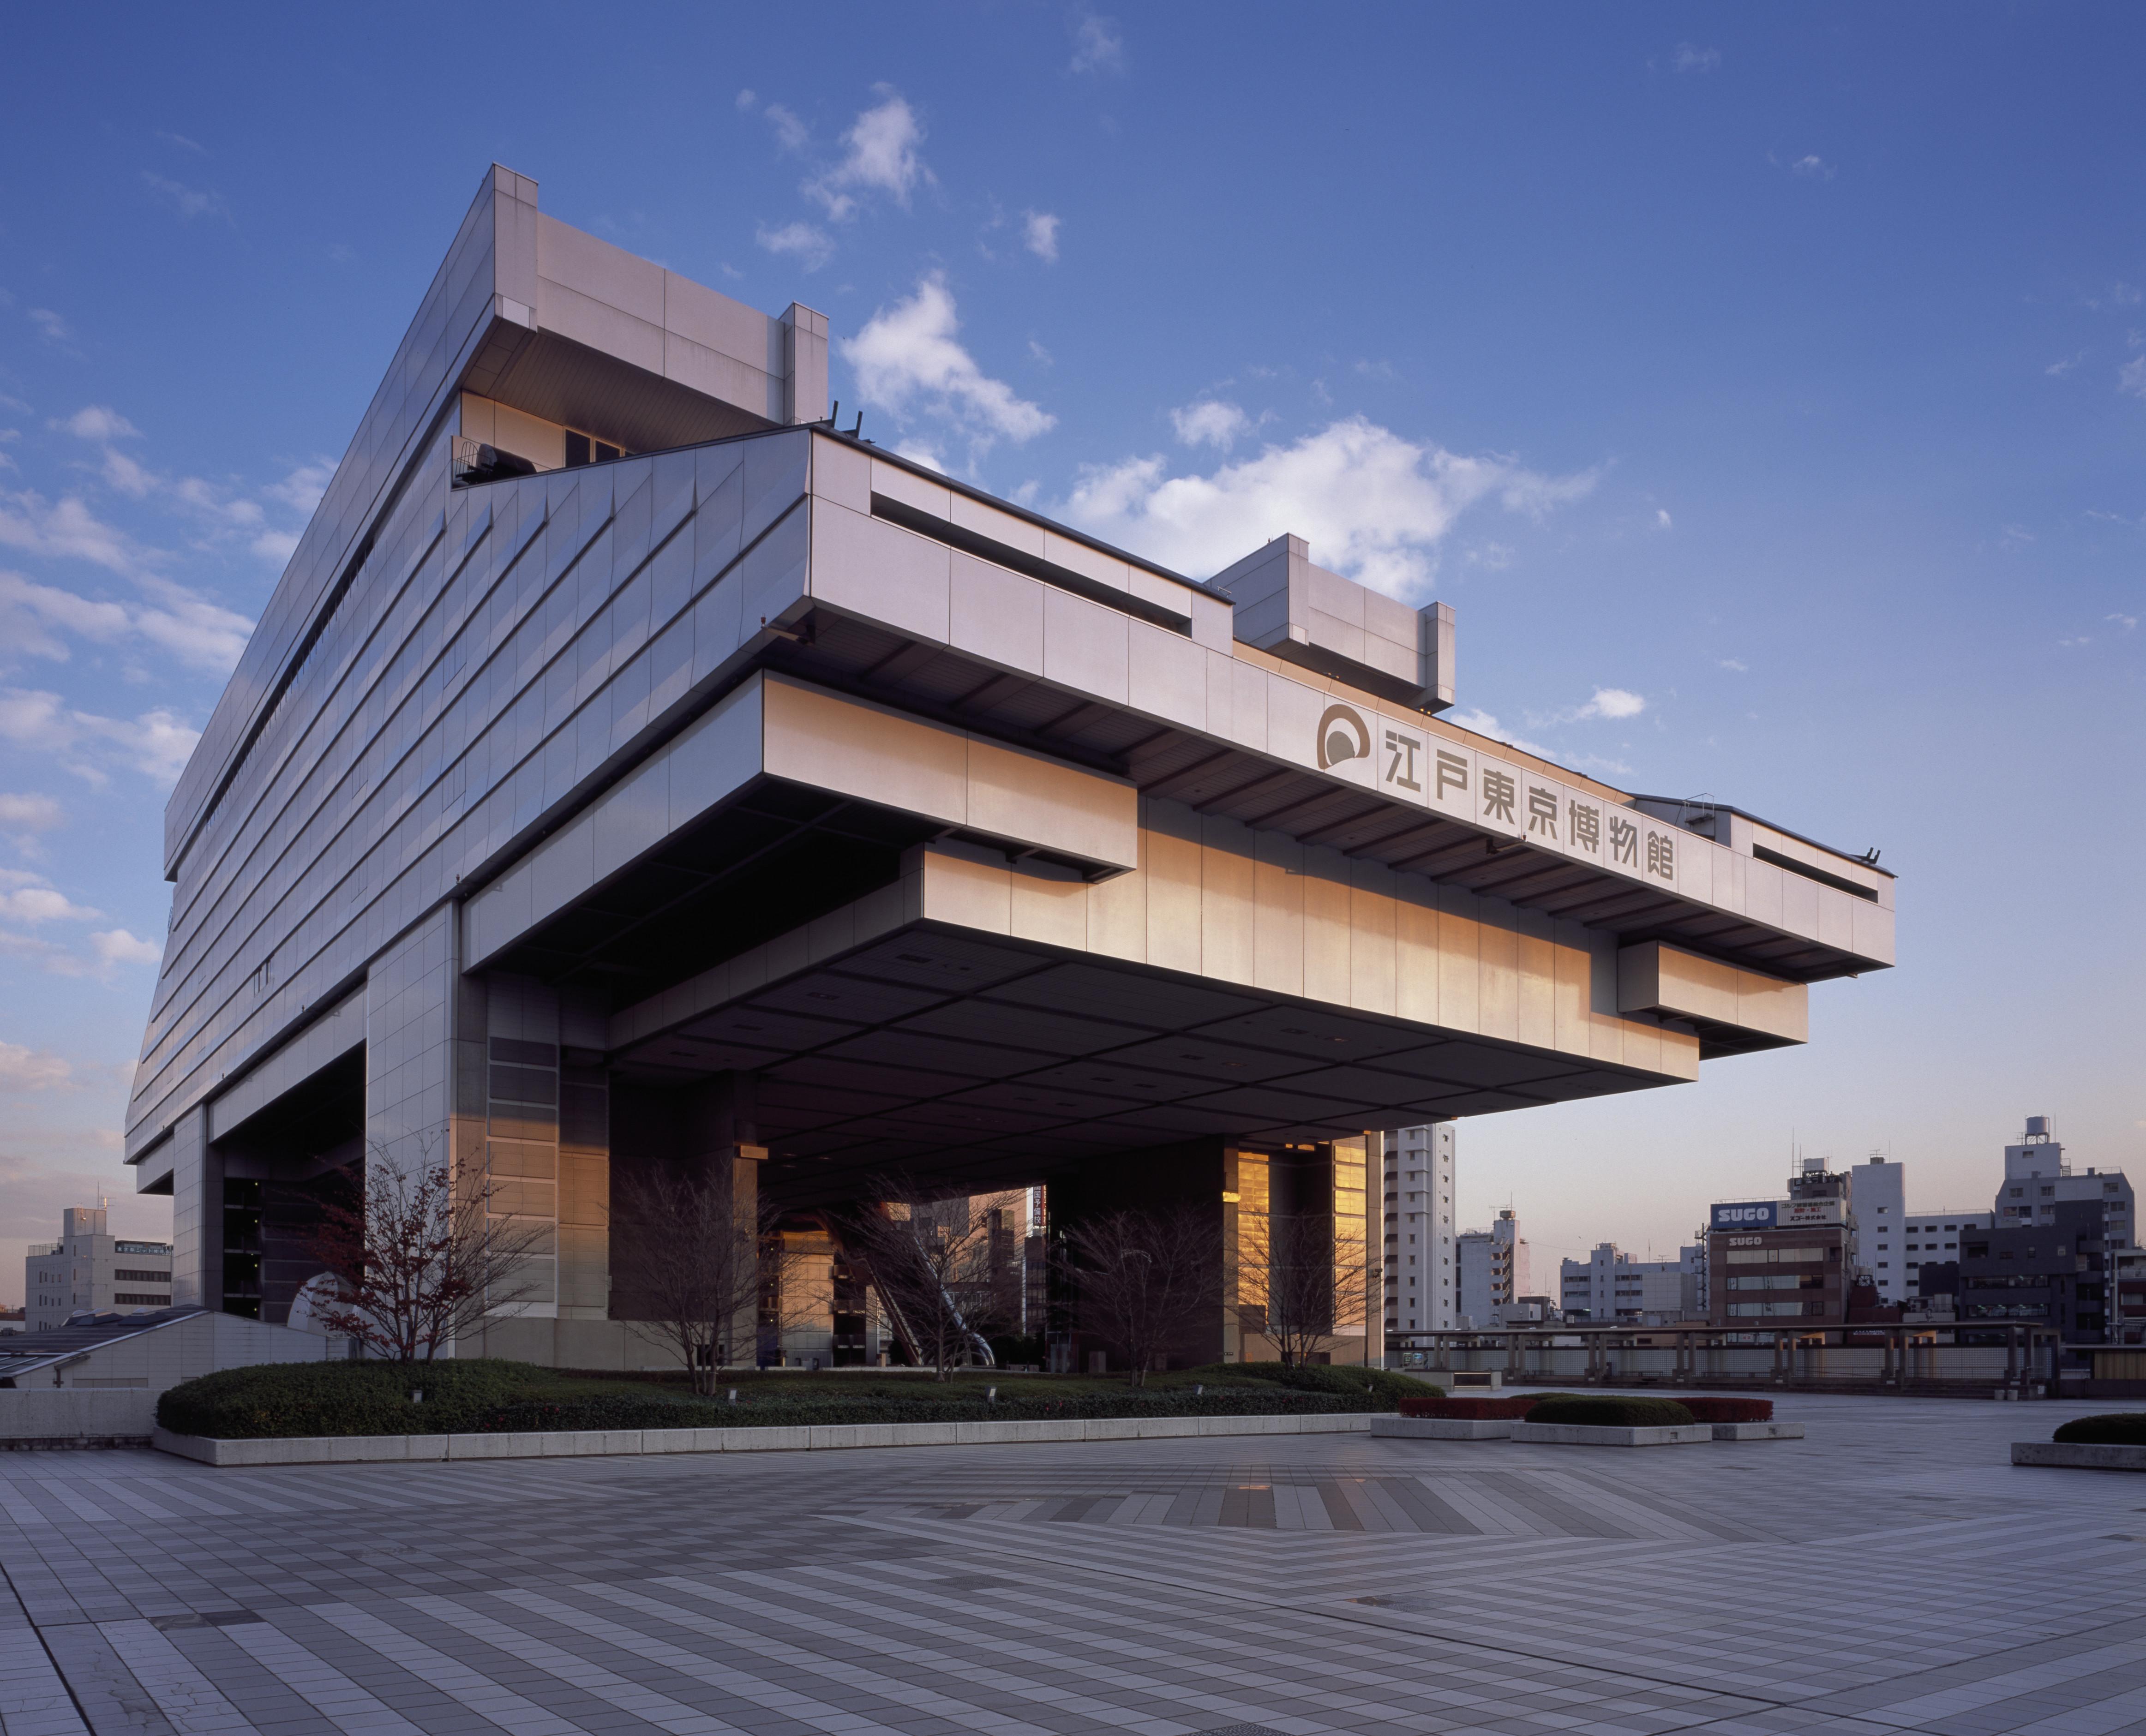 Edo-Tokyo Museum in Tokyo, Japan.